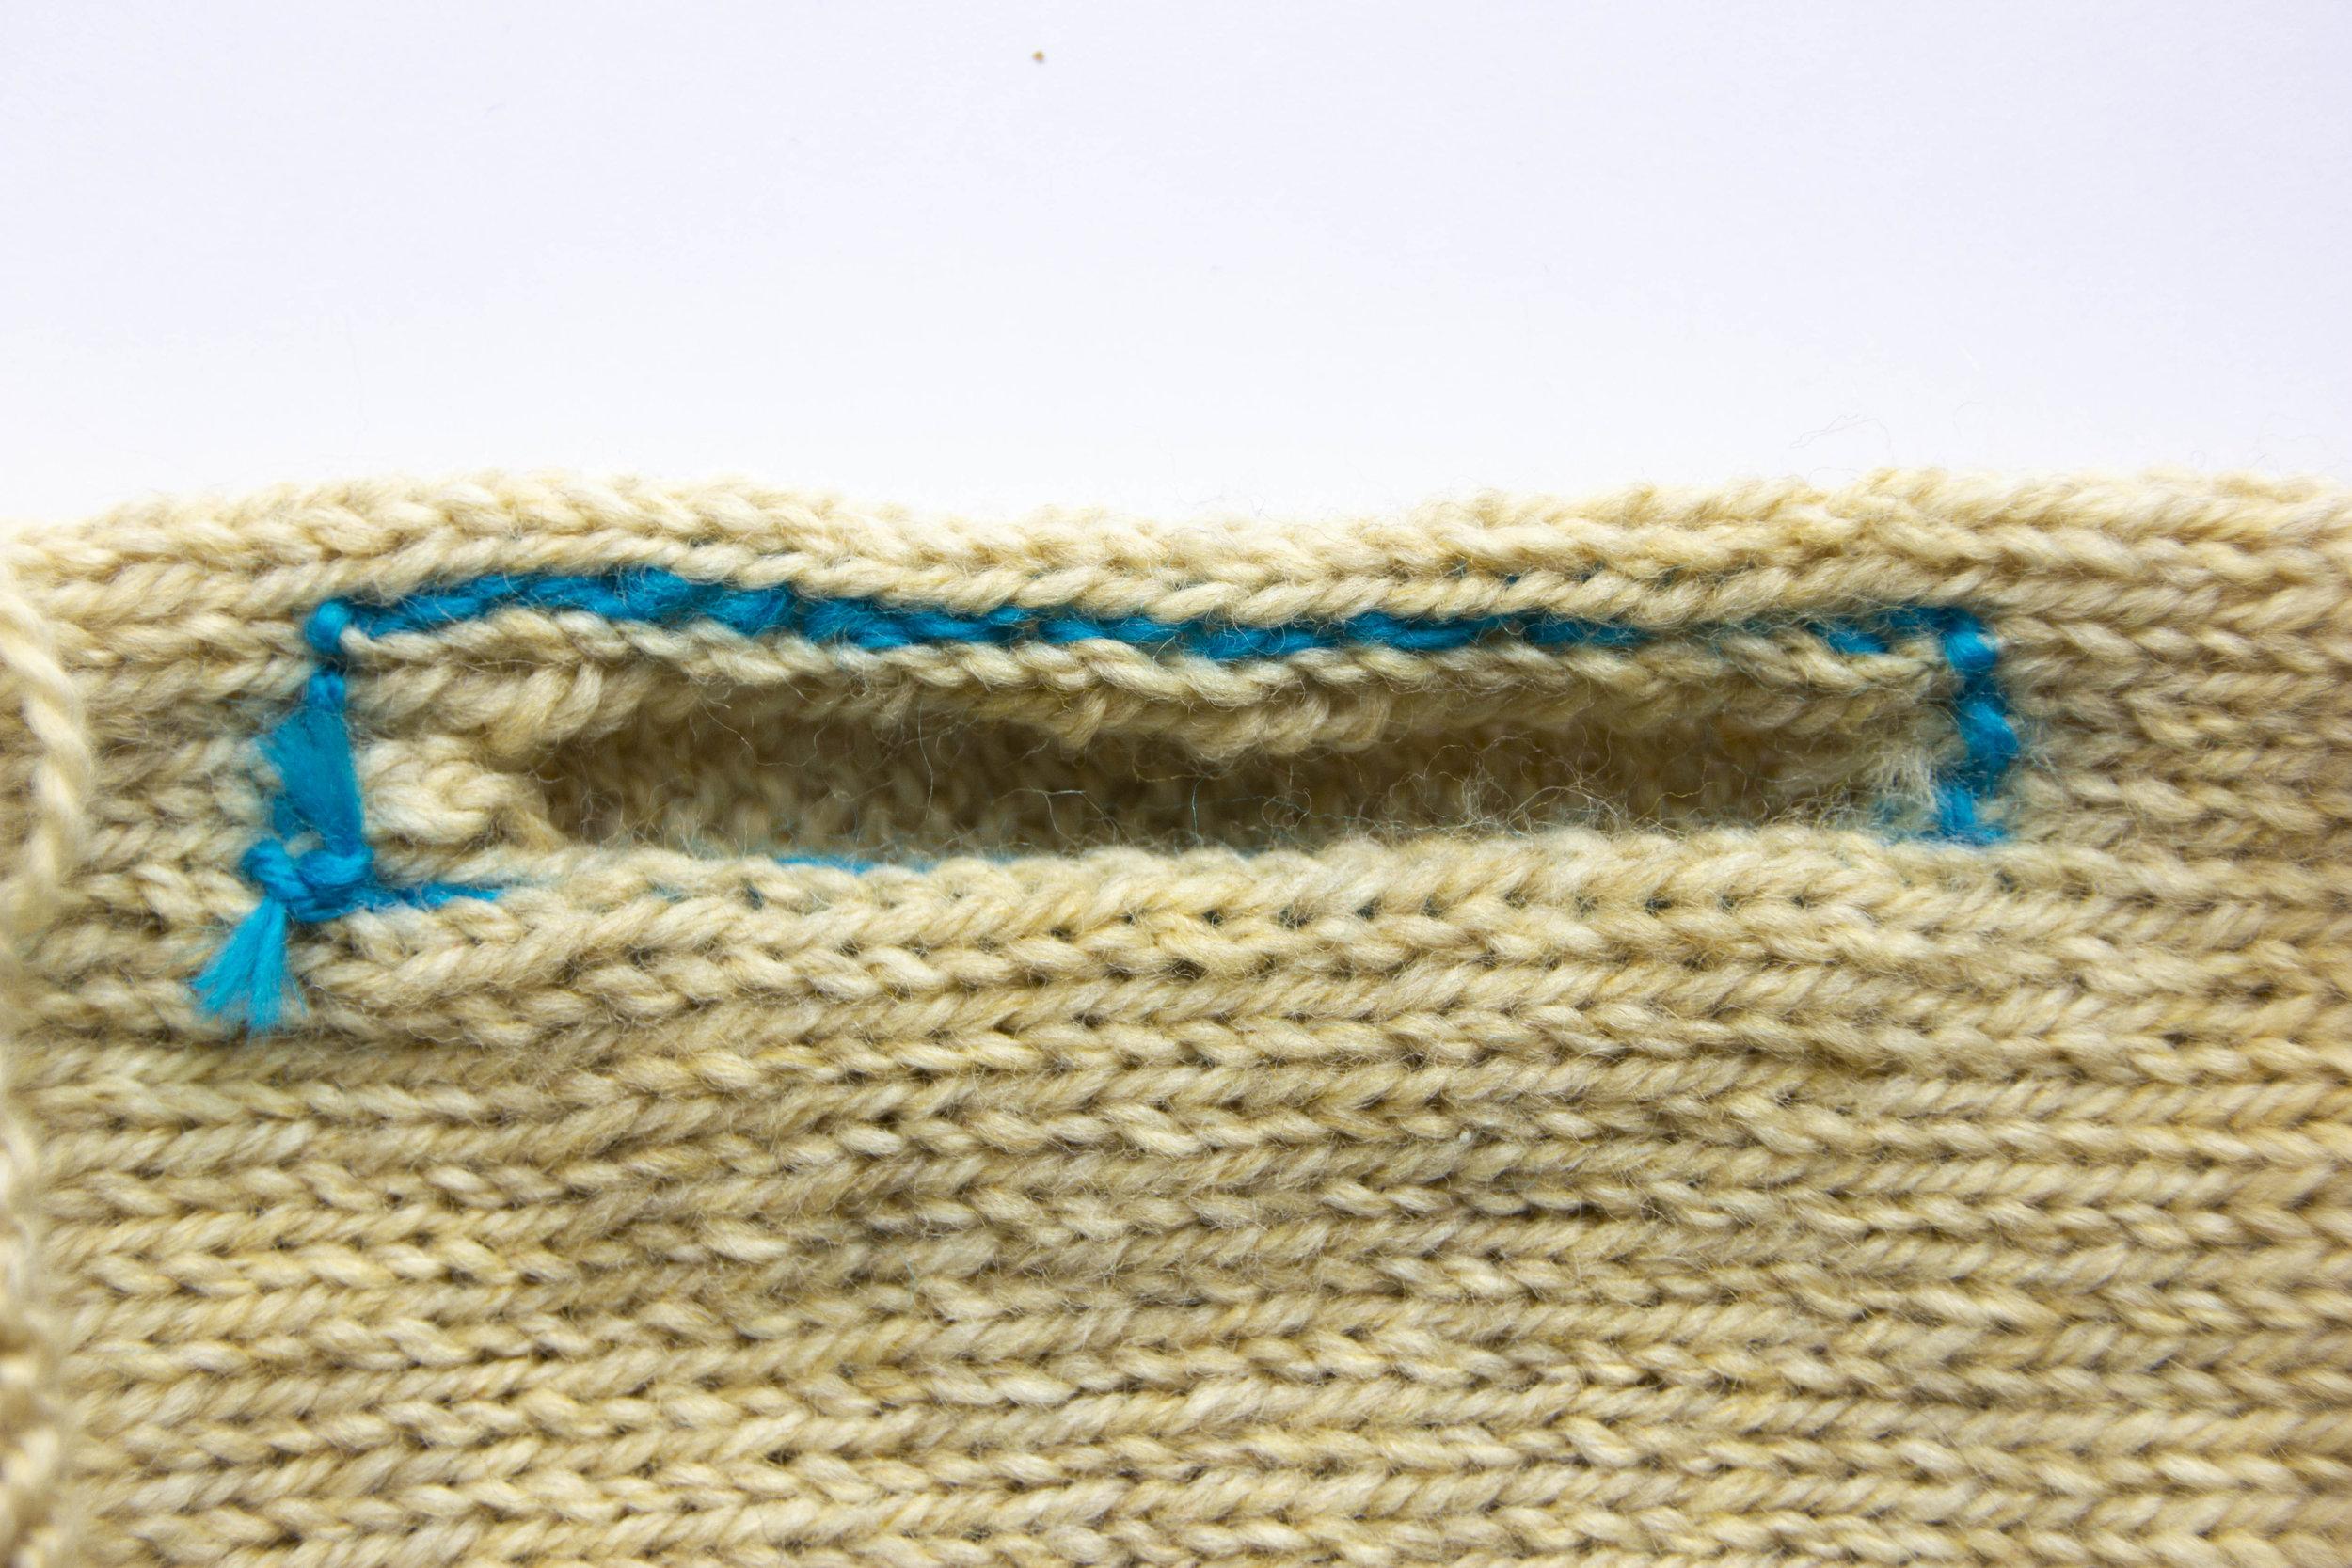 merele back stitch steek finish.jpg